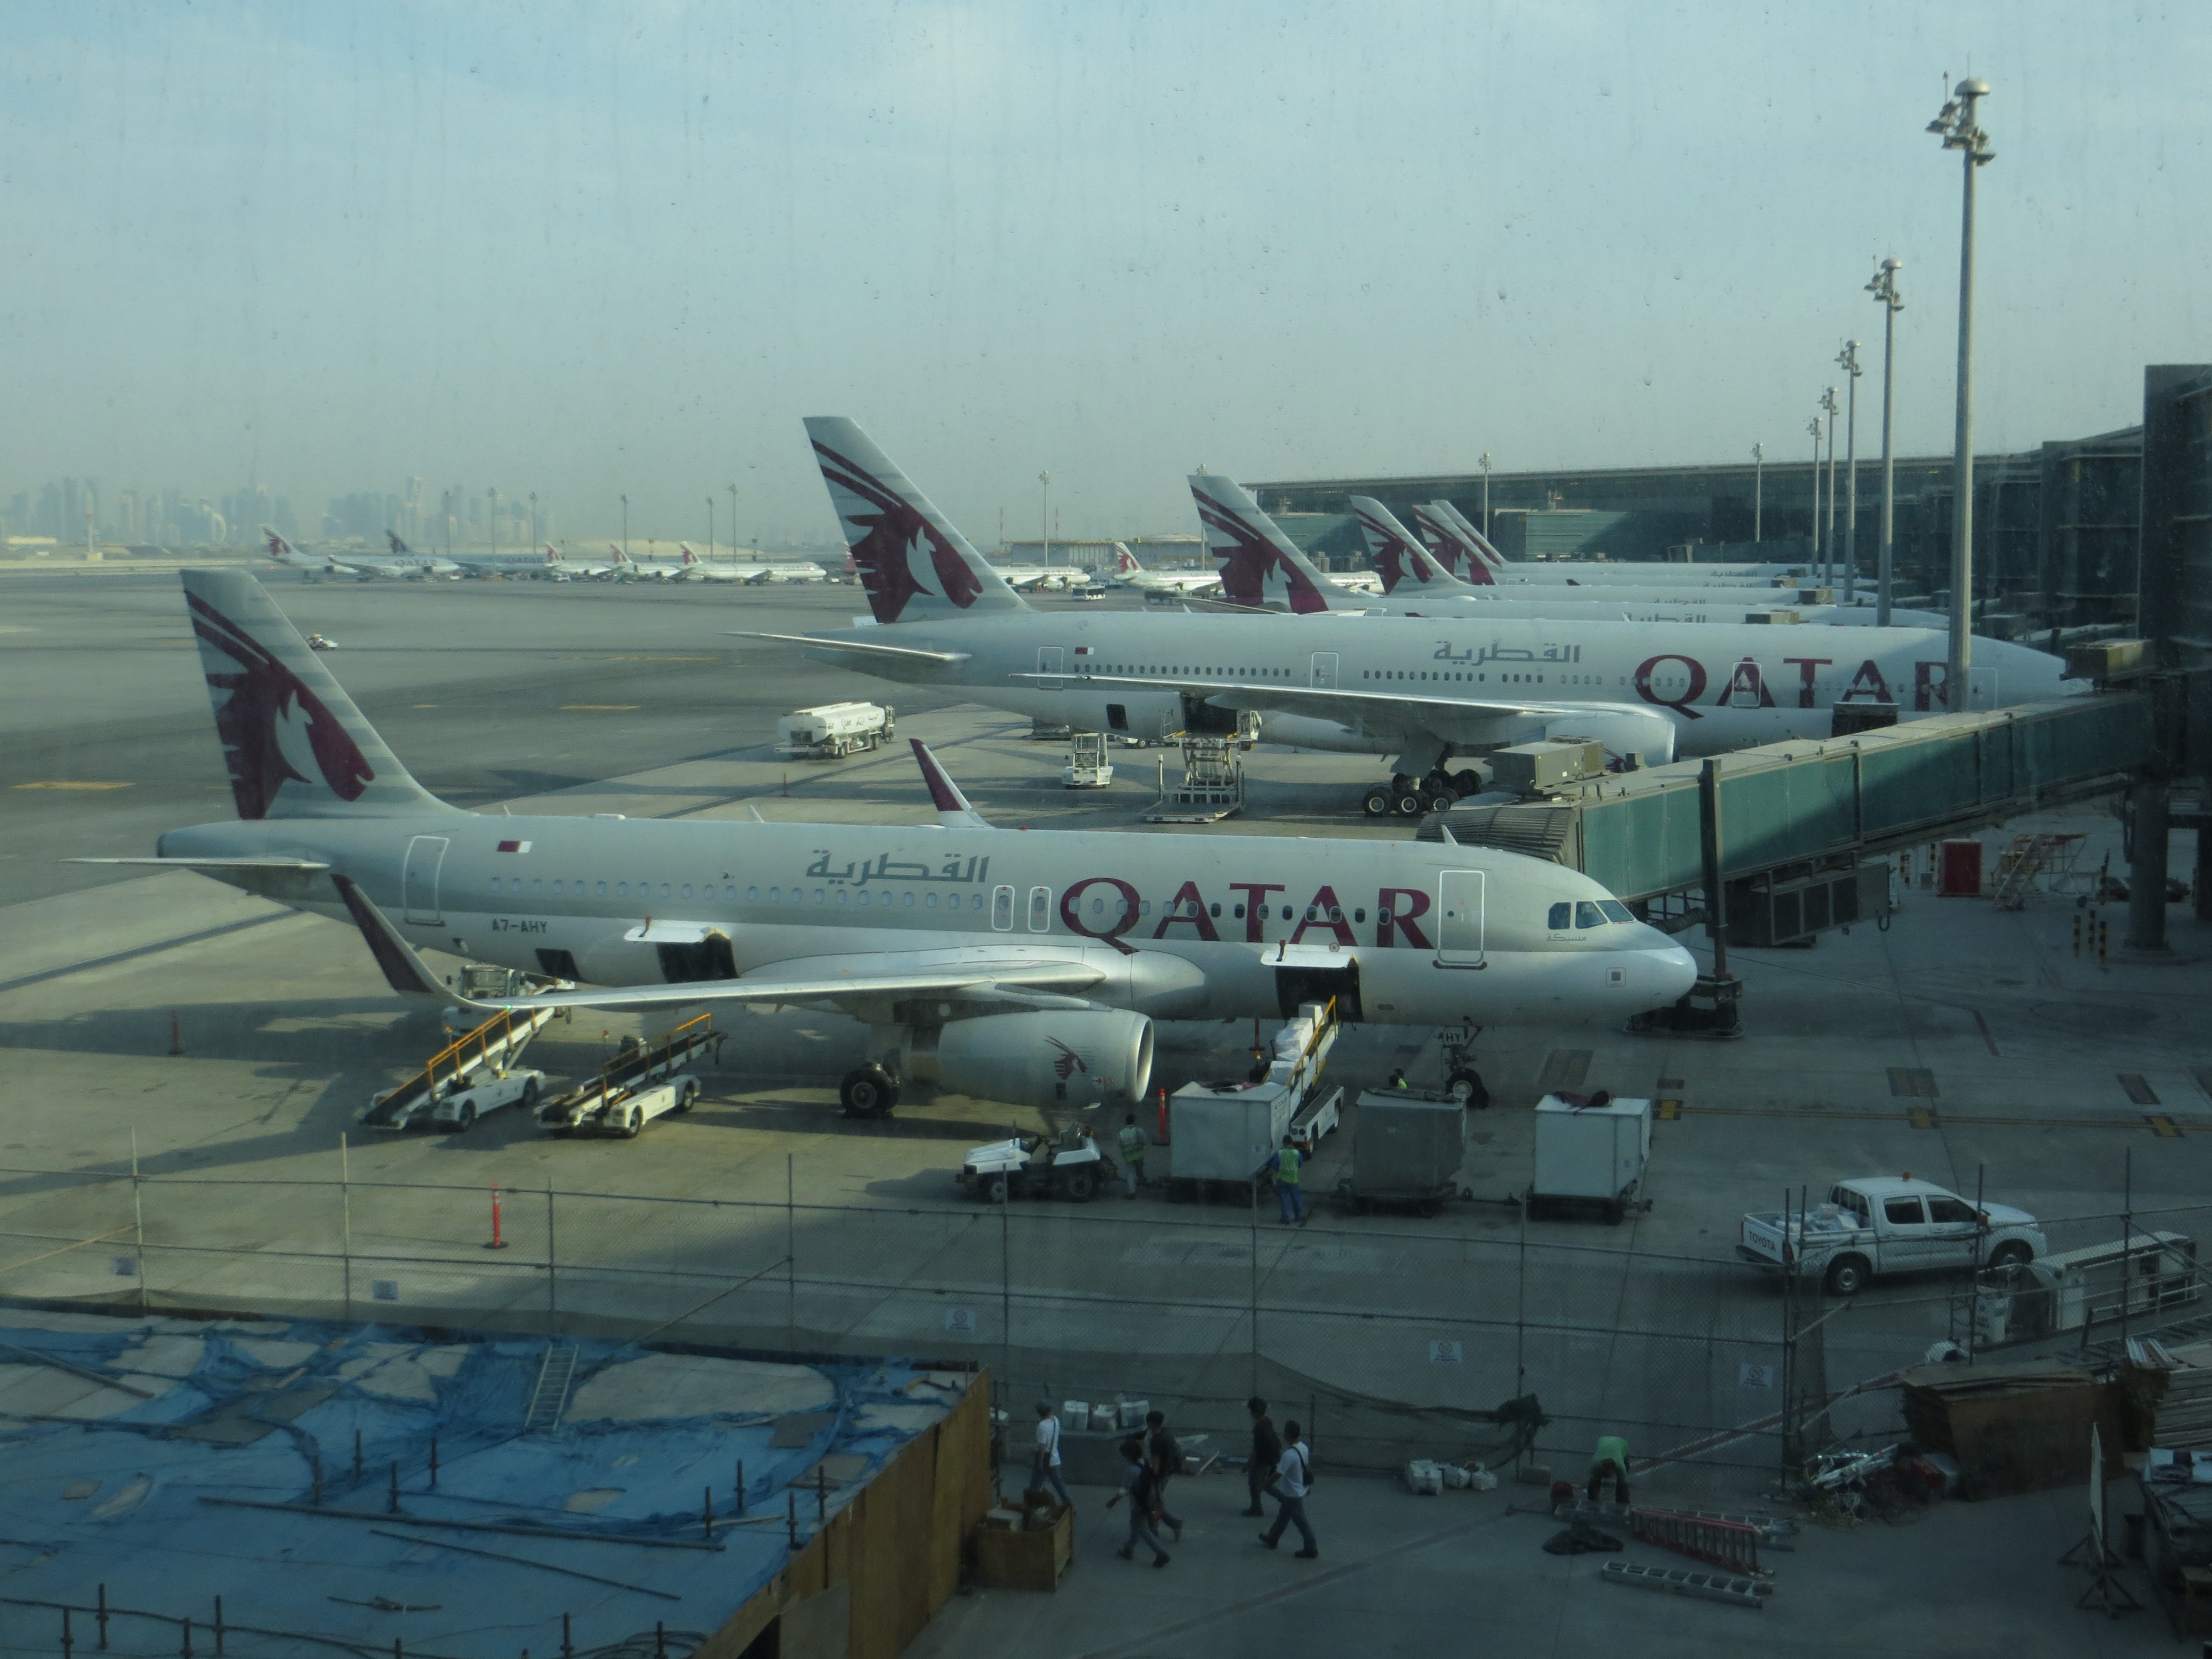 https://upload.wikimedia.org/wikipedia/commons/d/dd/QR_aircraft_at_Hamad_Airport%2C_07-2014.JPG